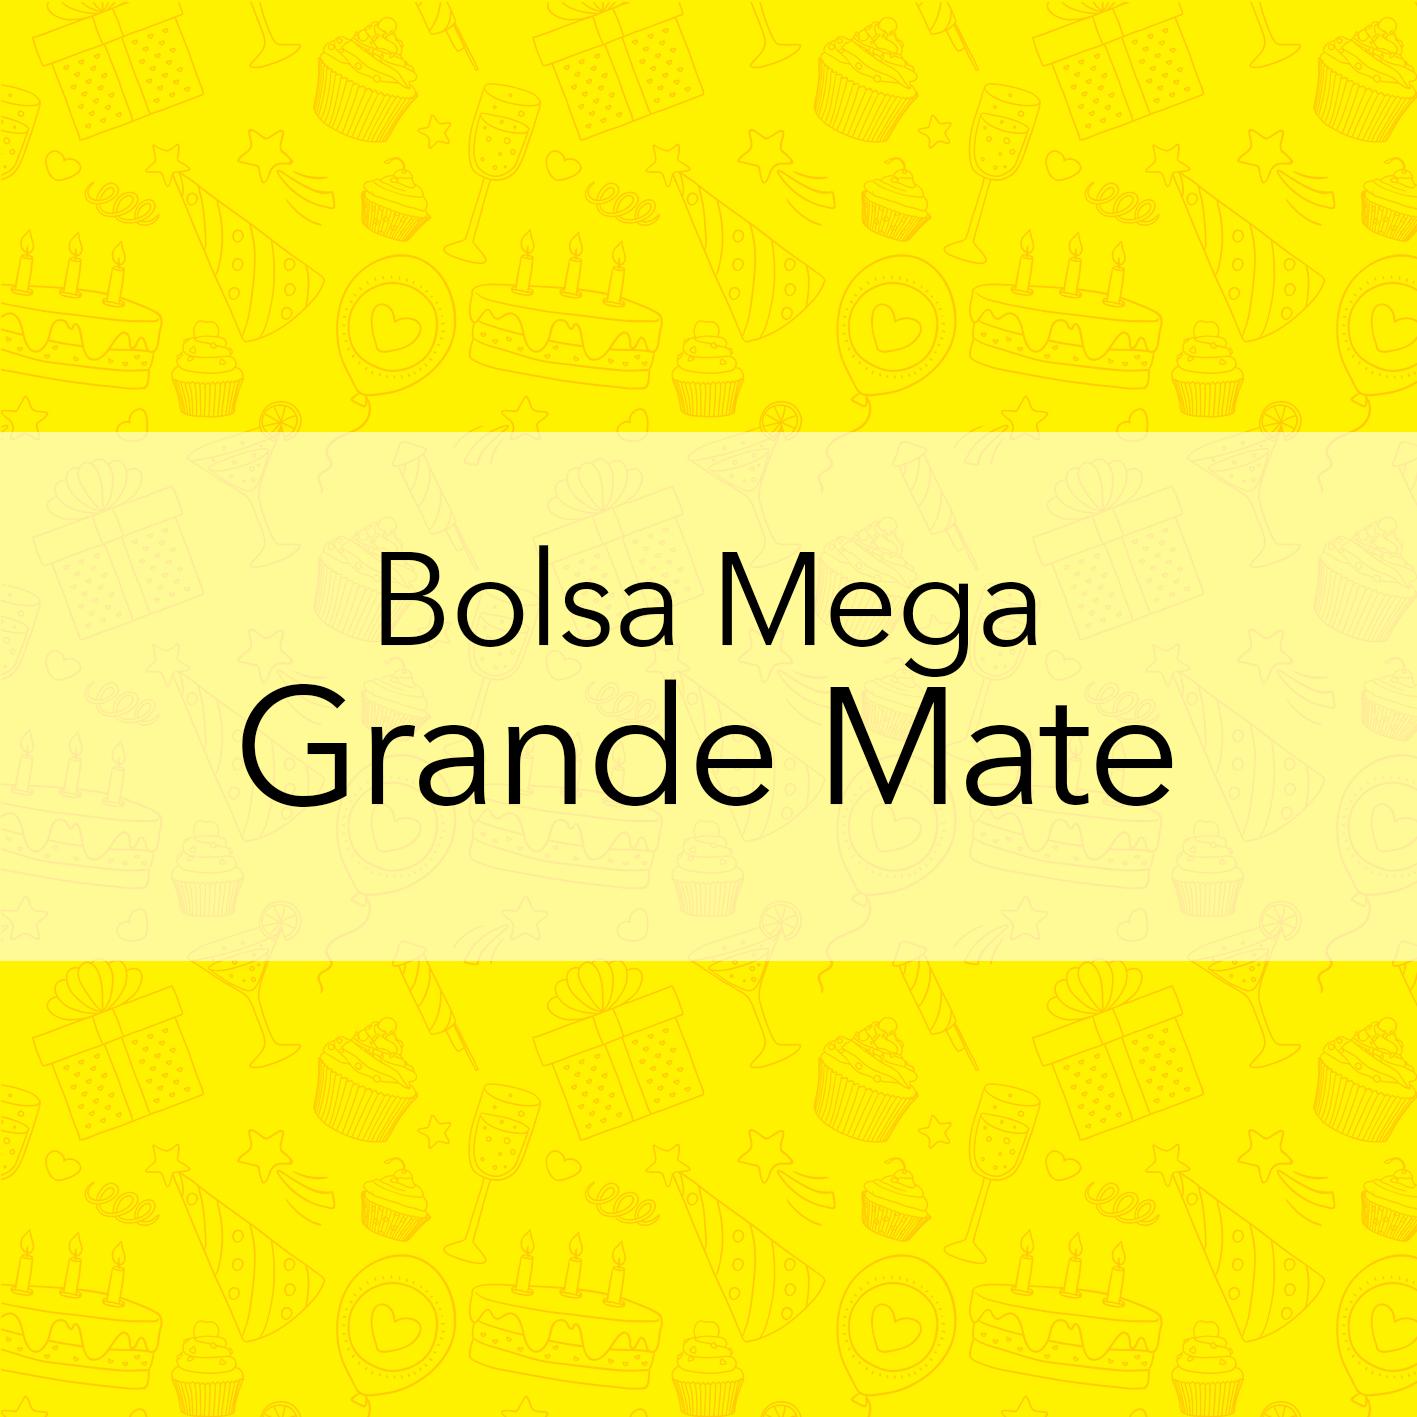 BOLSA MEGA GRANDE